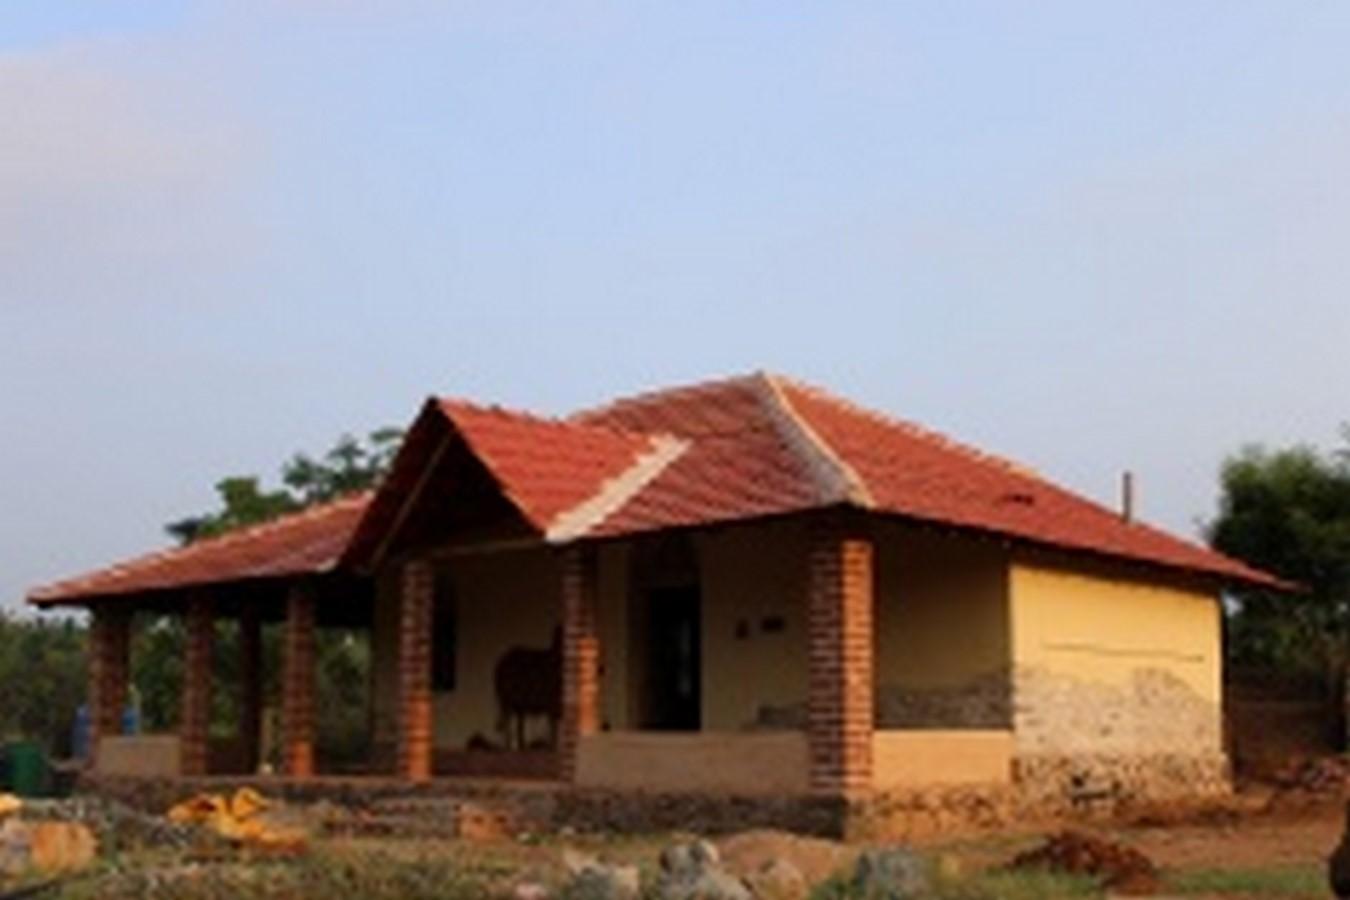 6 Architects inspired by Nari Gandhi - Sheet12